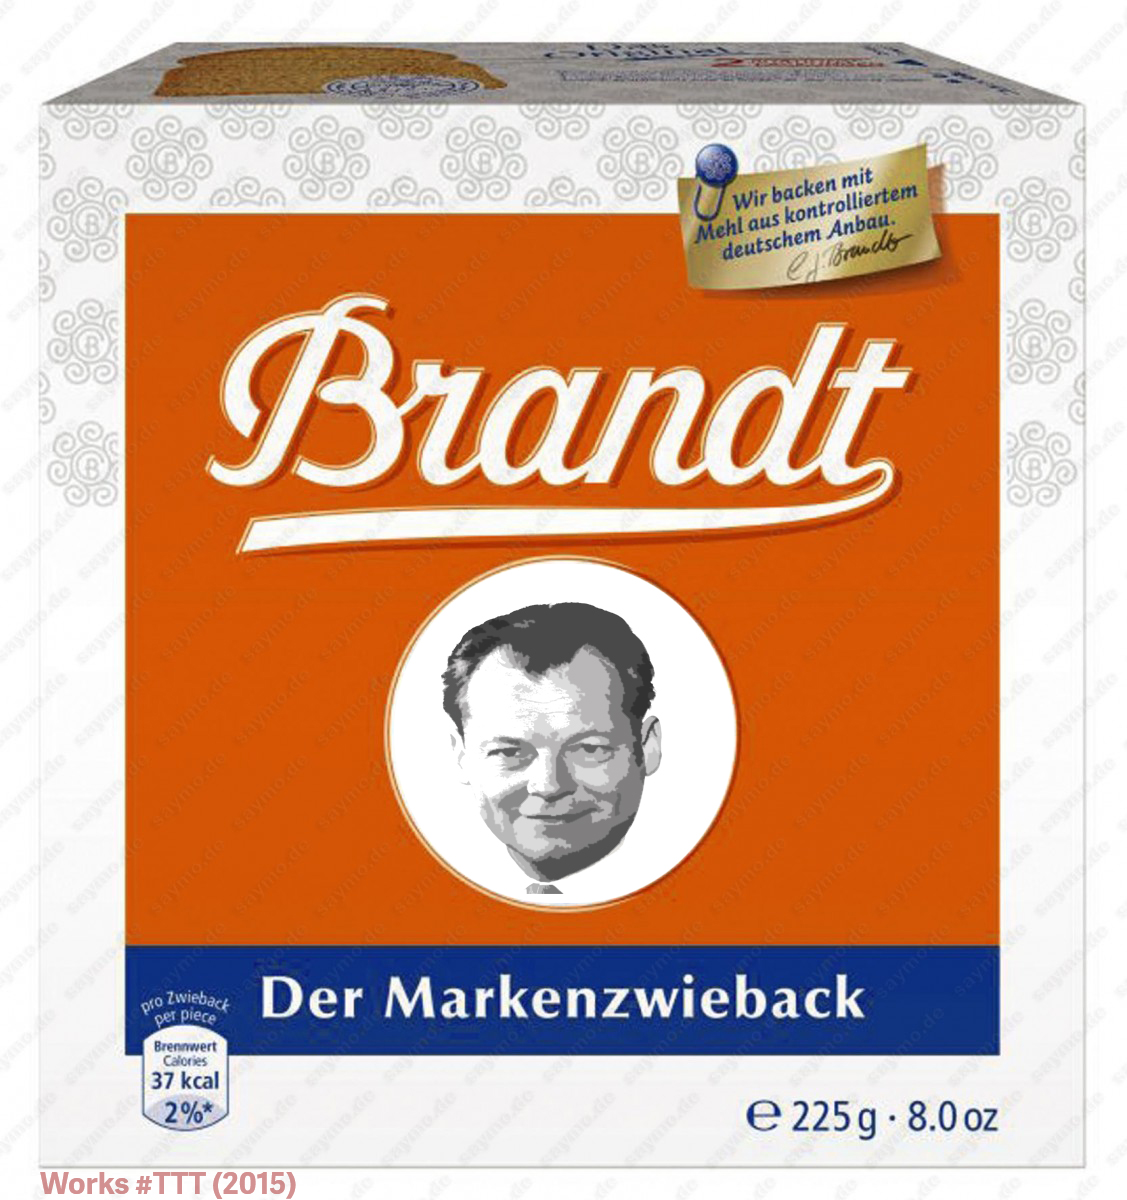 Brandt.Zwieback